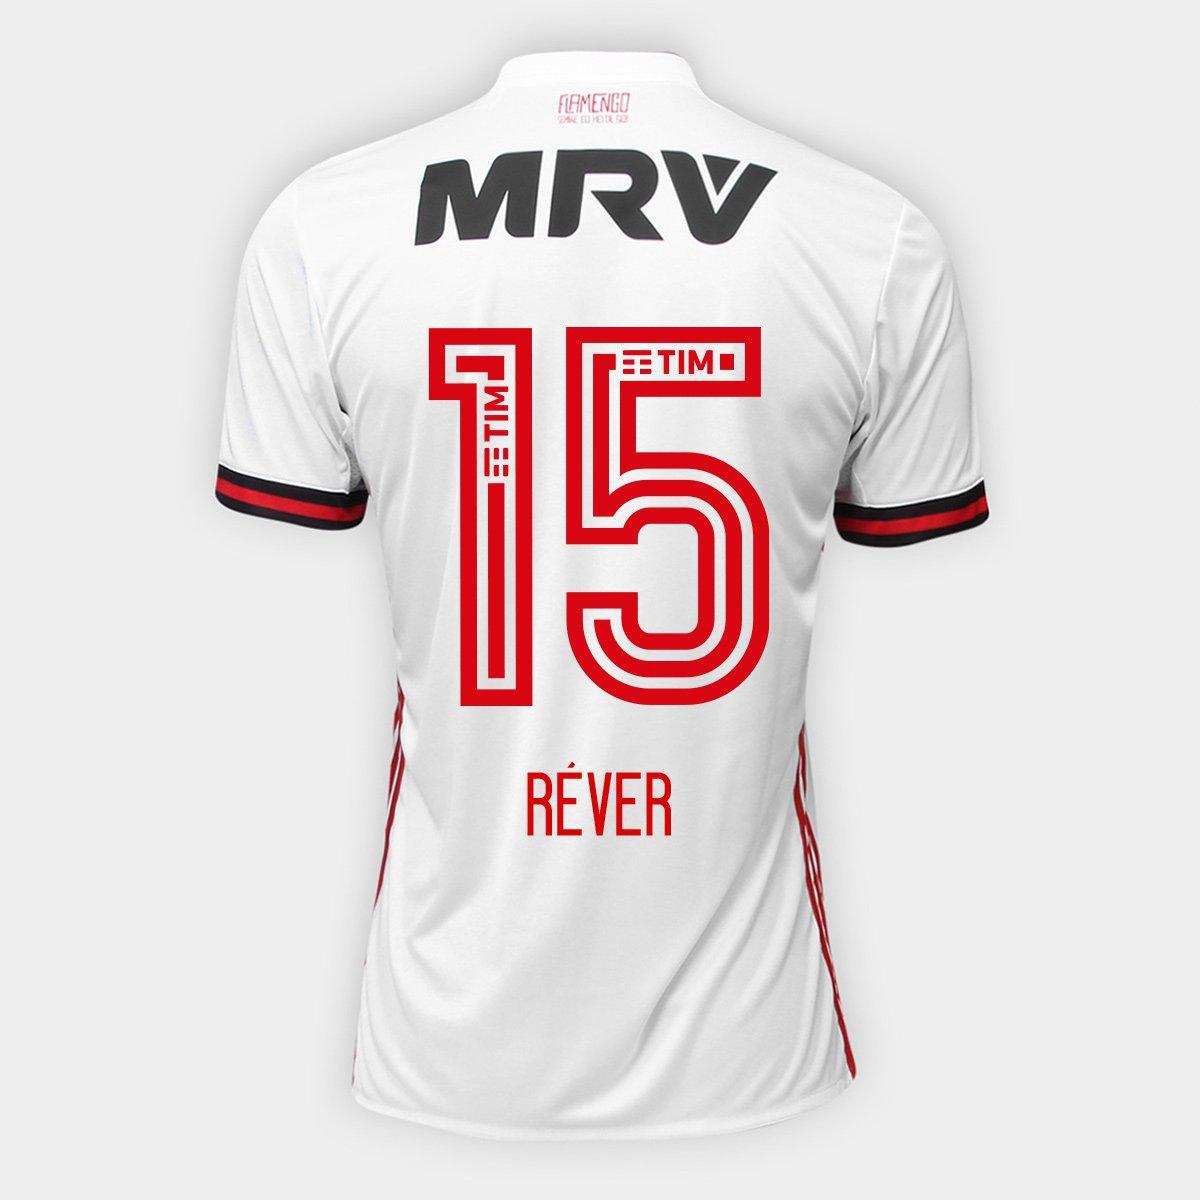 f91aa1212d010 Camisa Flamengo II 17 18 N° 15 - Réver Adidas Masculina - Compre Agora